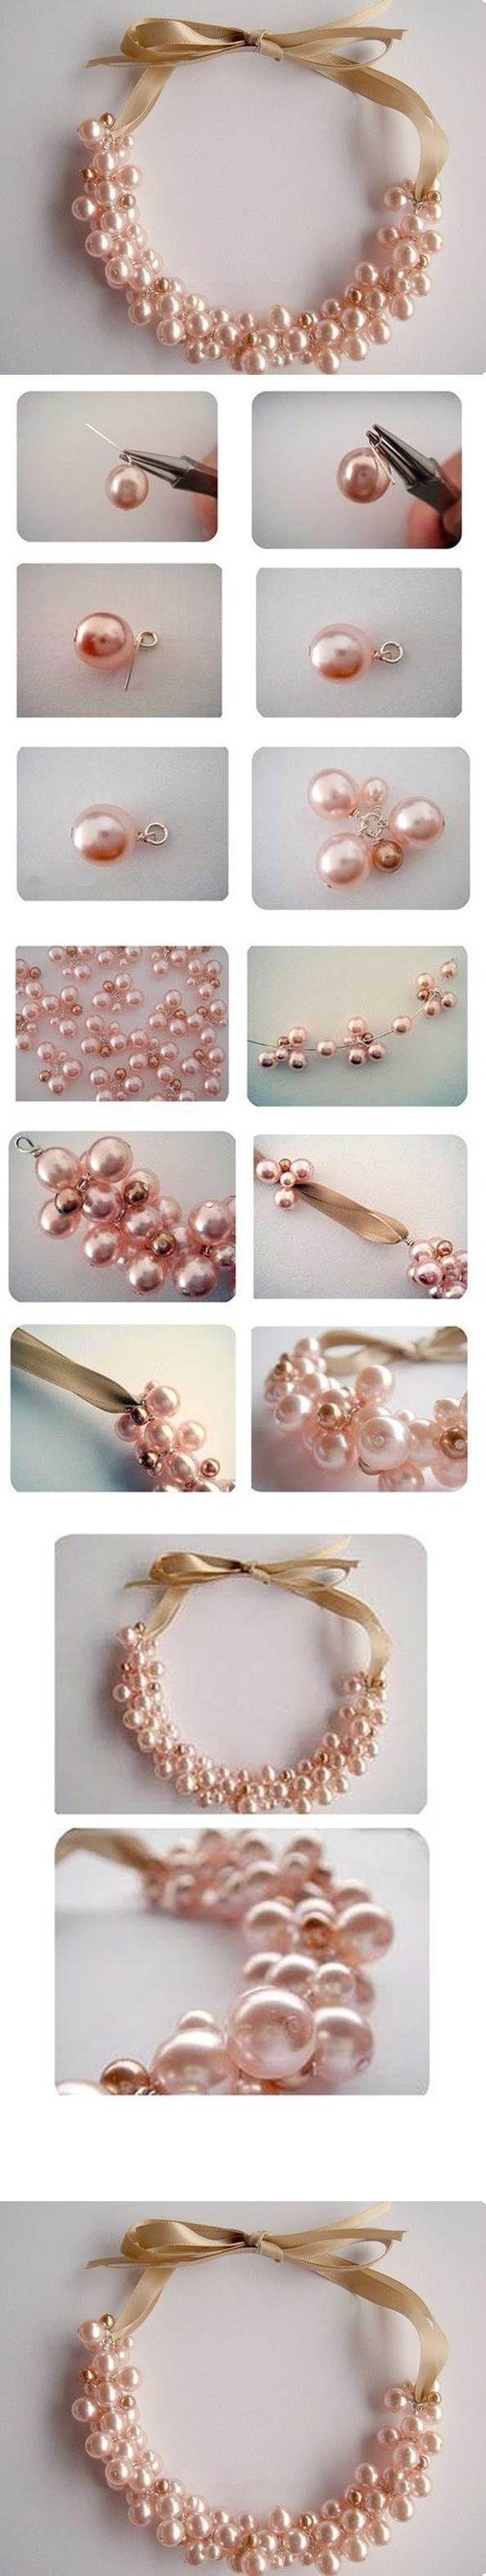 paso a paso para hacer este hermoso collar de perlas #diy